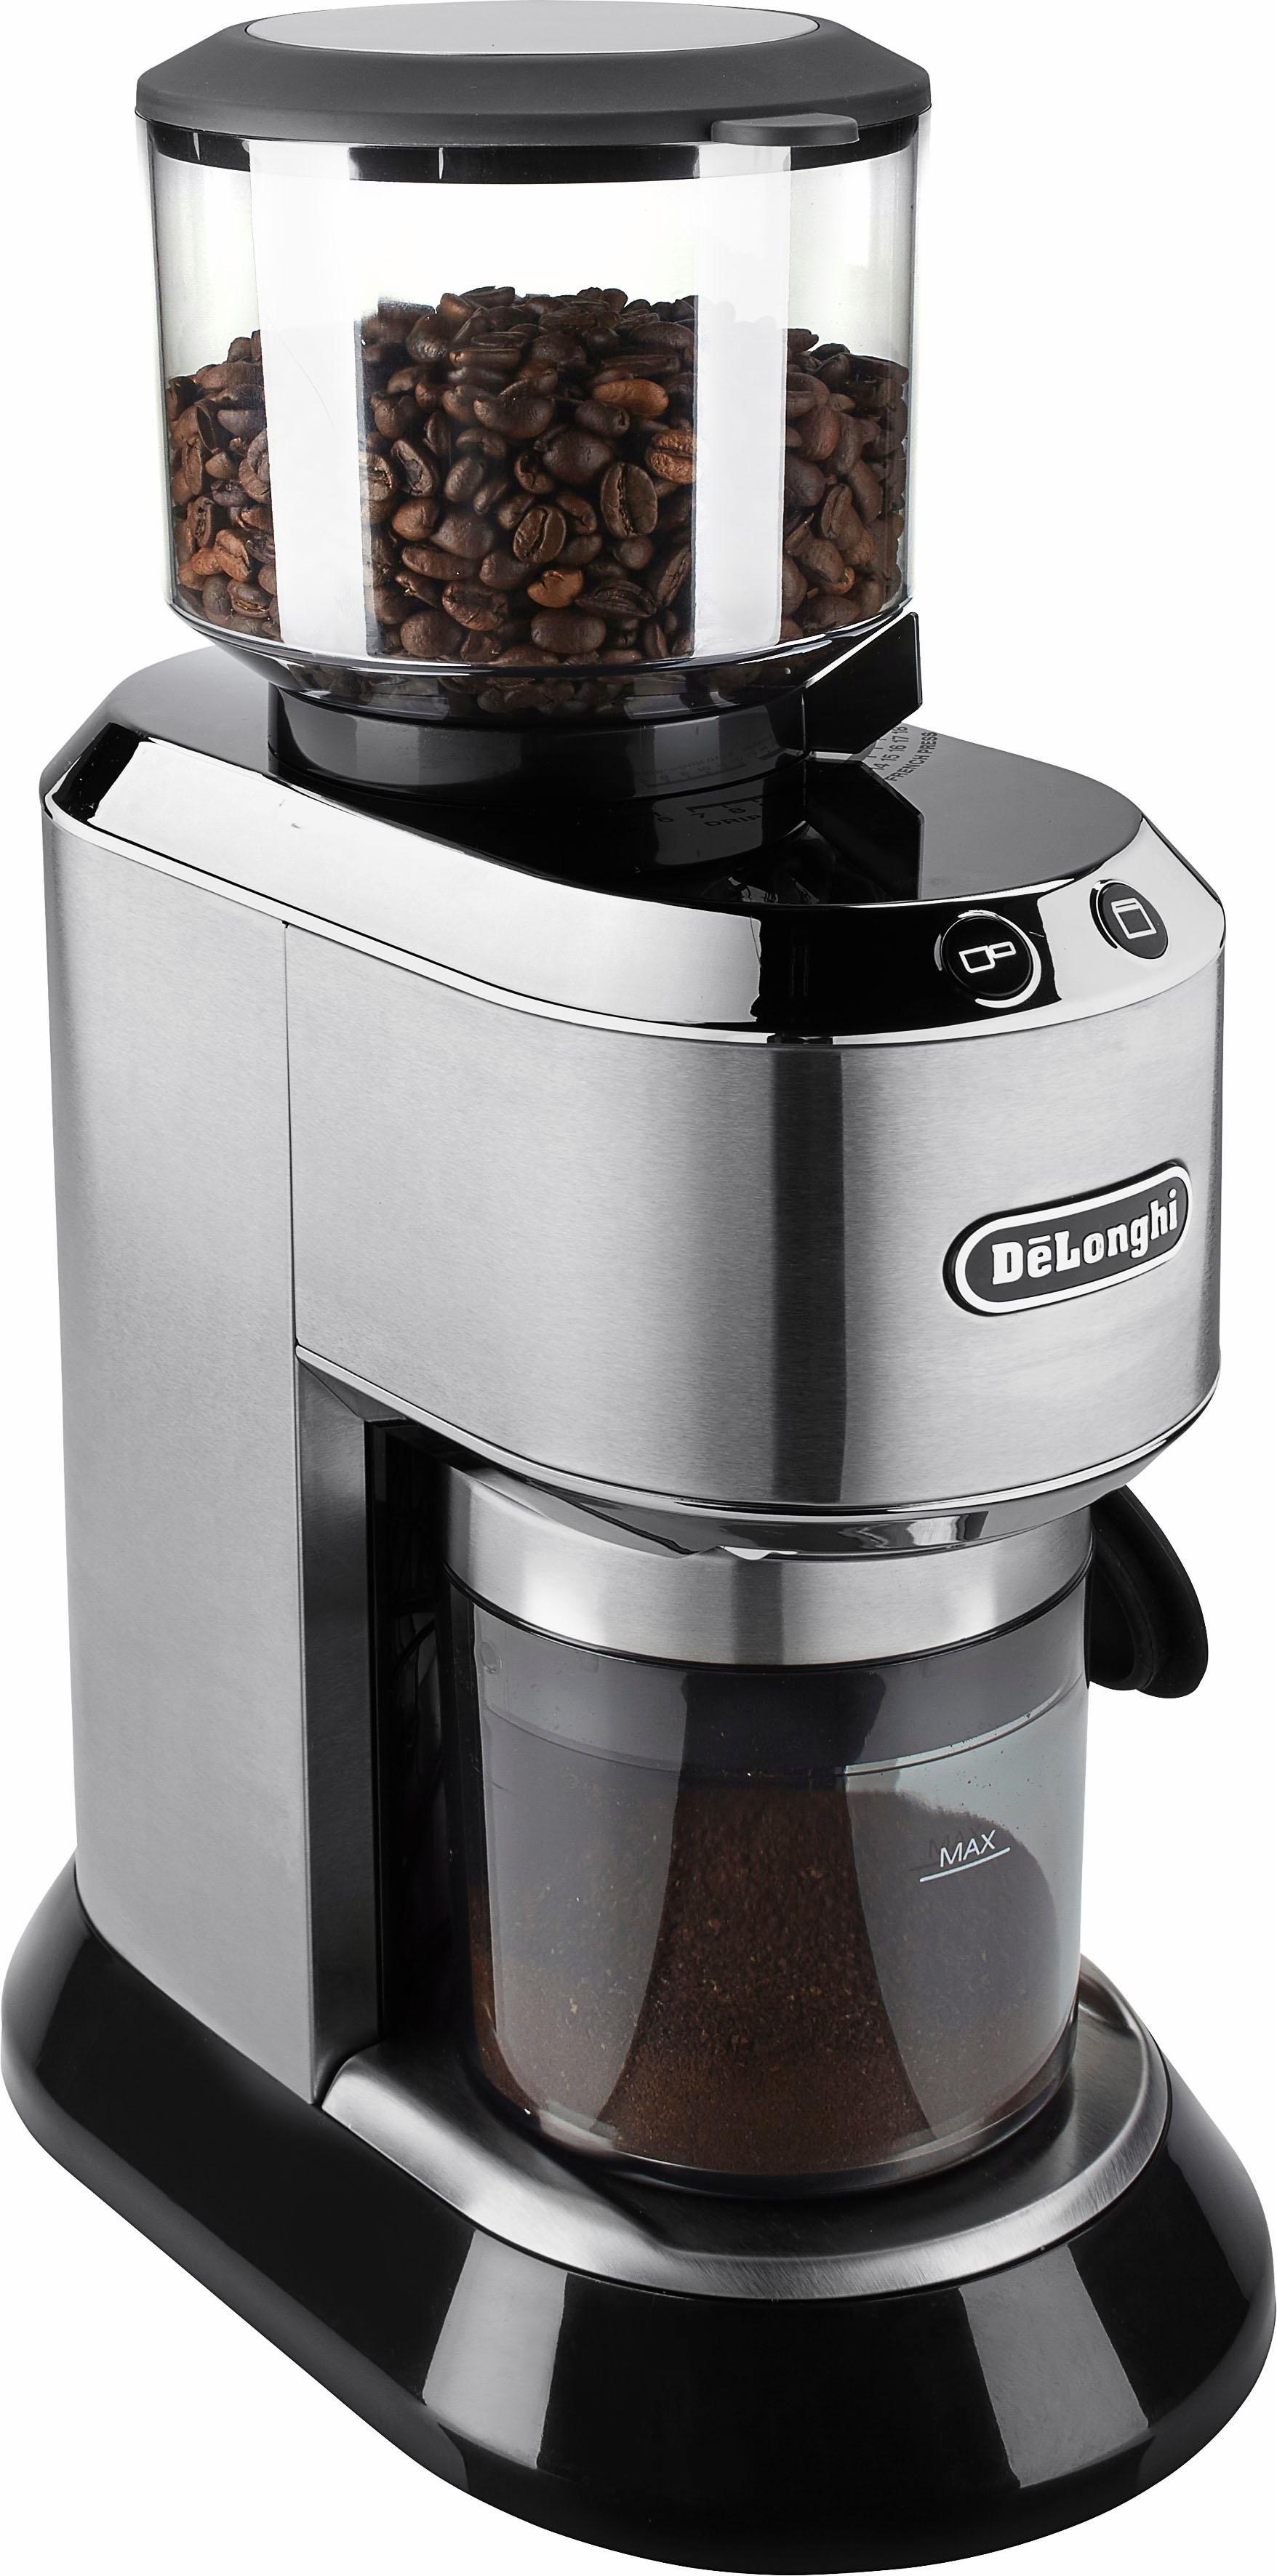 De'Longhi koffiemolen Dedica KG520.M inclusief filteradapter in de webshop van OTTO kopen